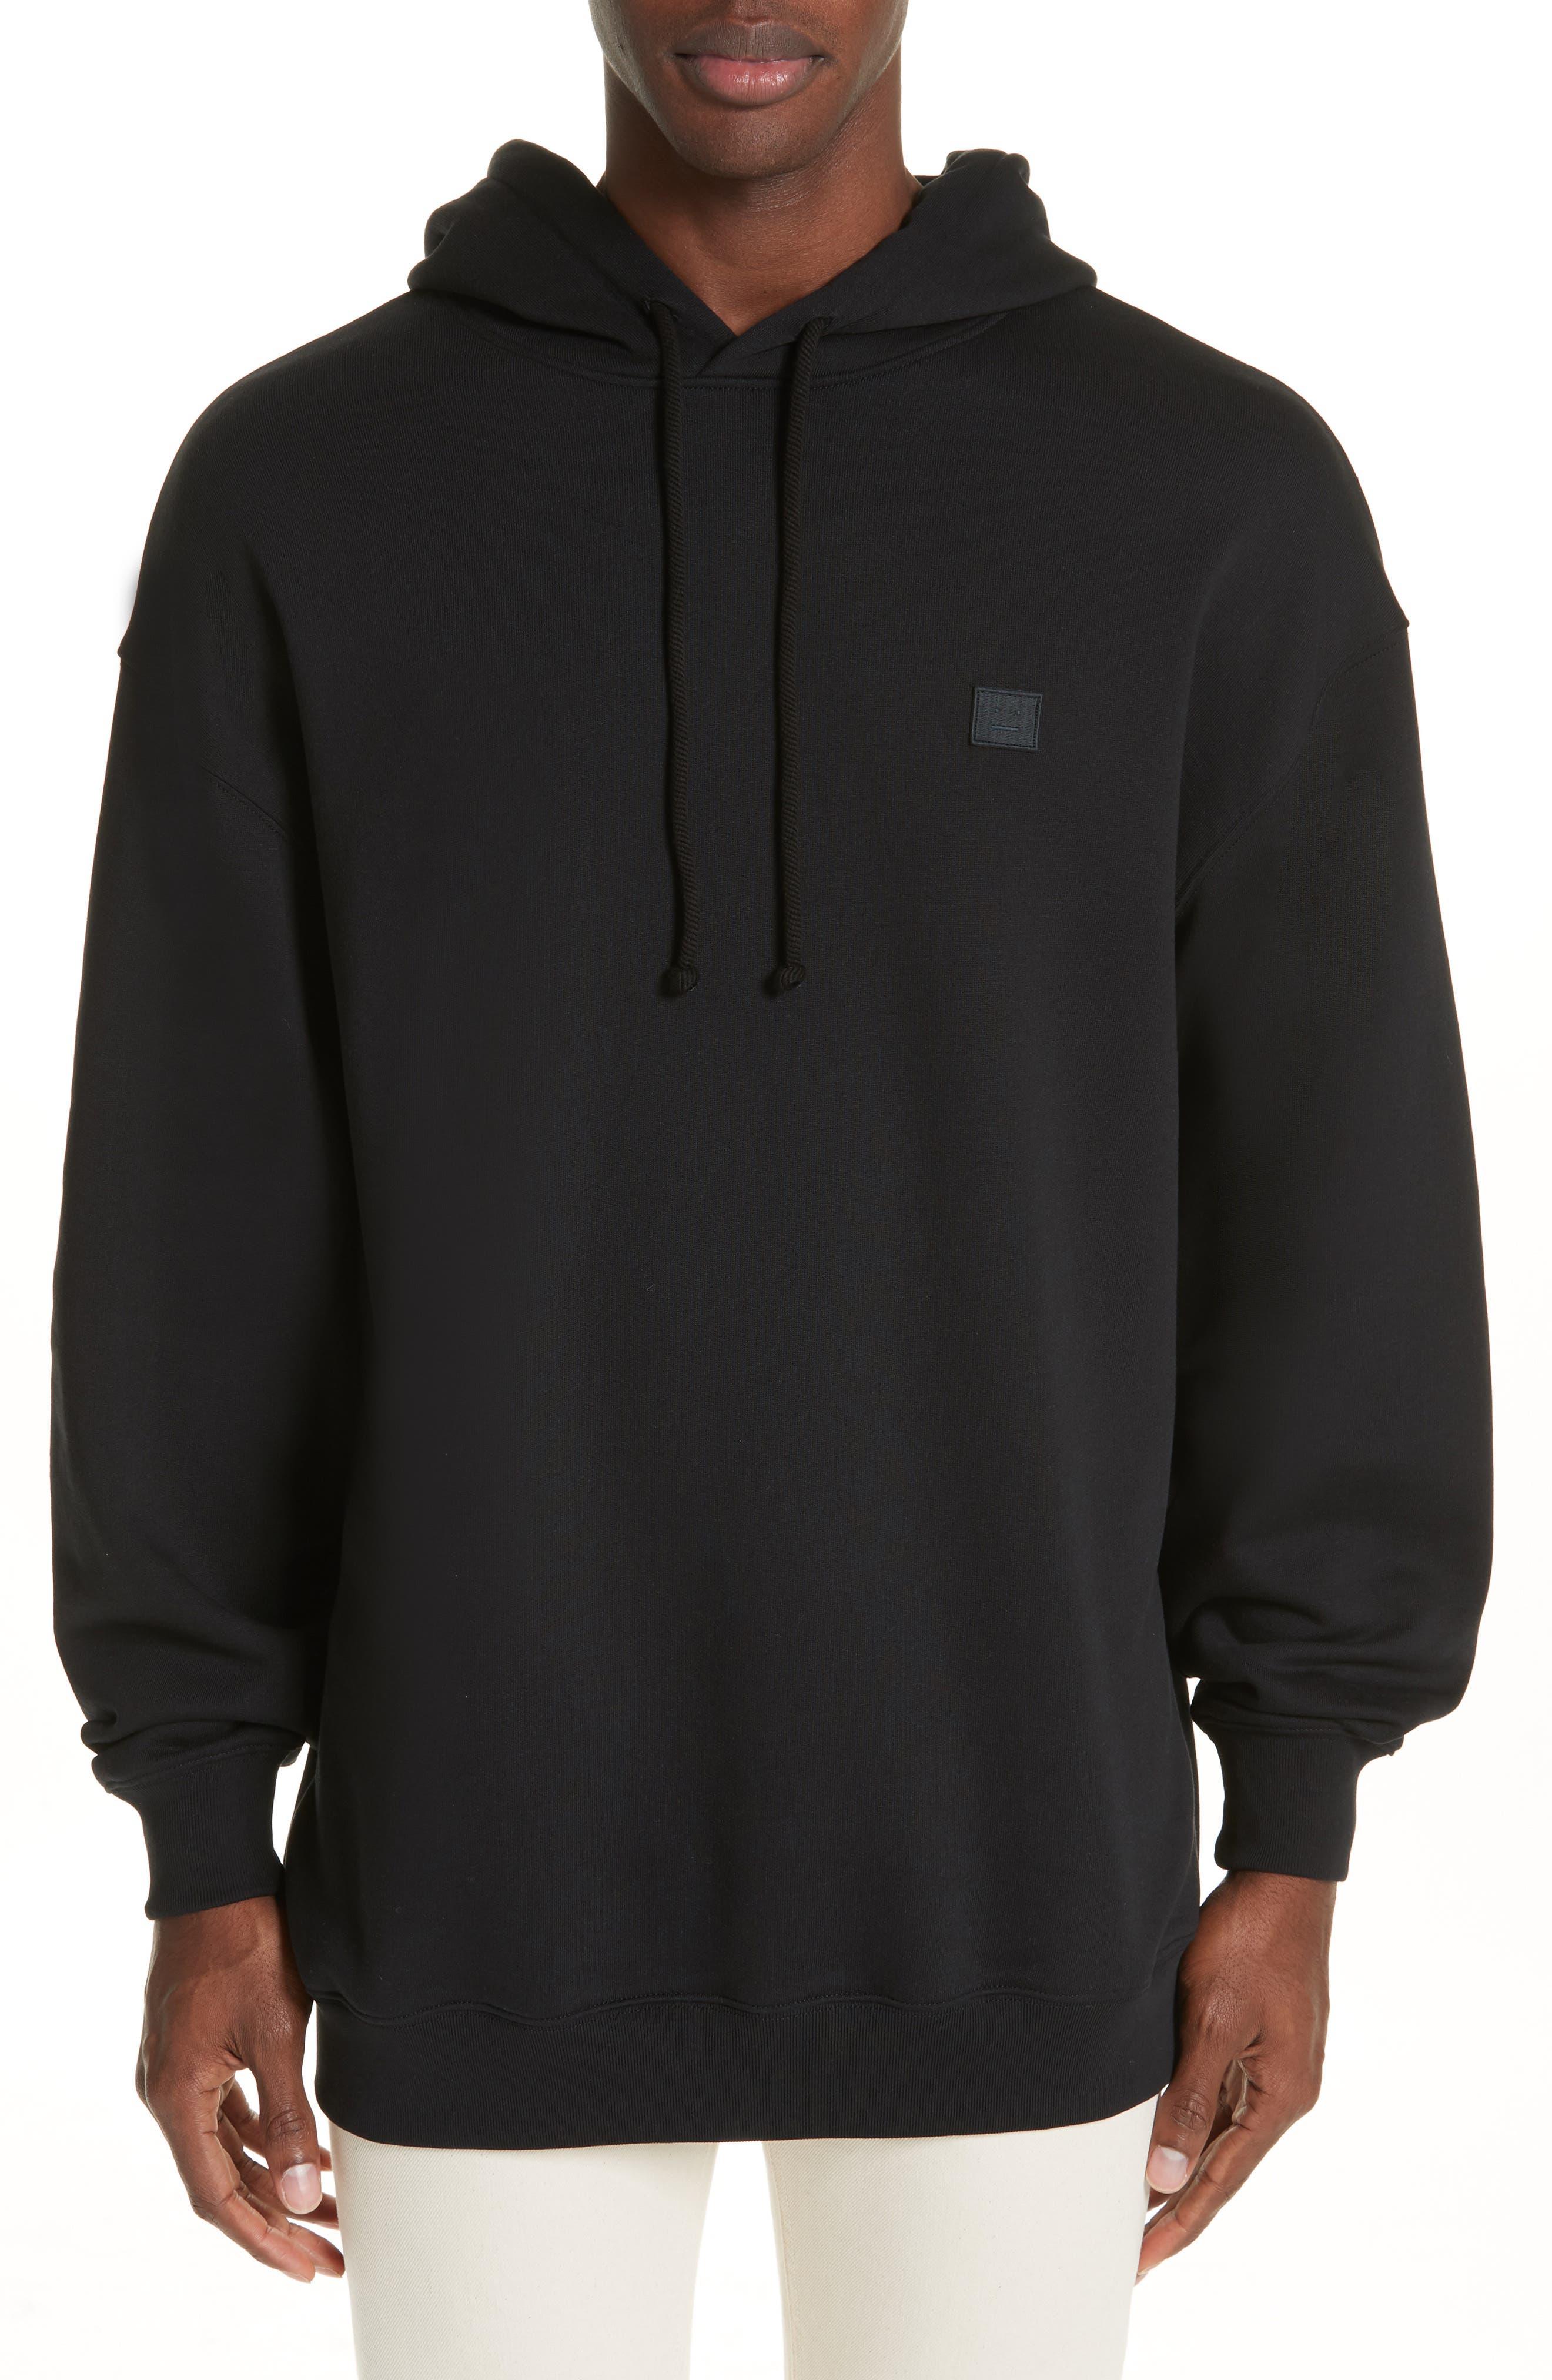 ACNE STUDIOS, Farrin Face Hooded Sweatshirt, Main thumbnail 1, color, BLACK